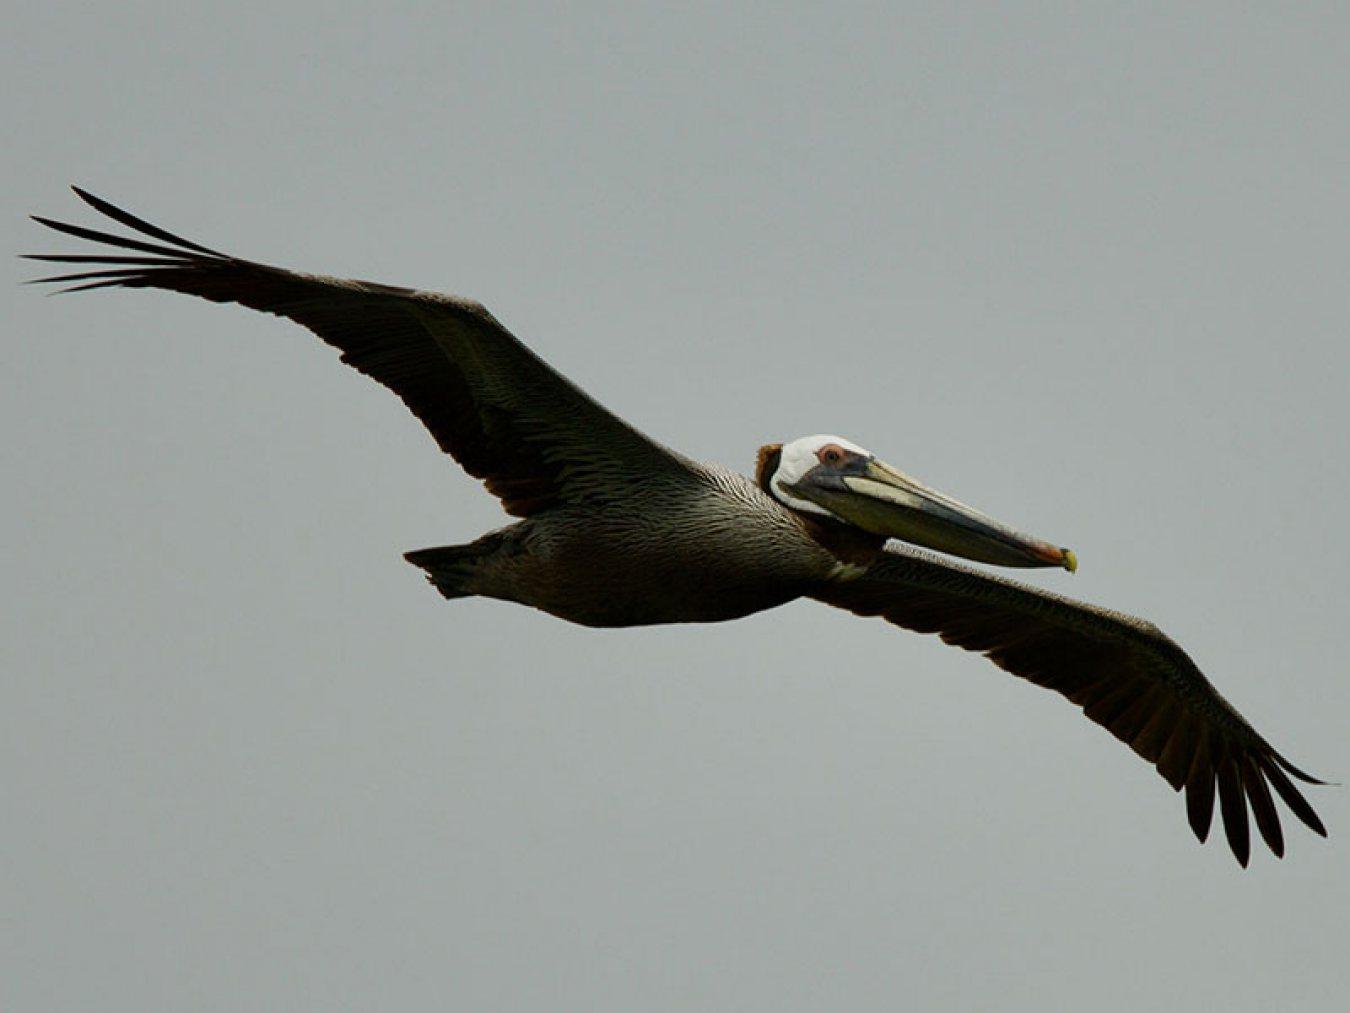 Brown Pelican at CHP by Robert Kirschner